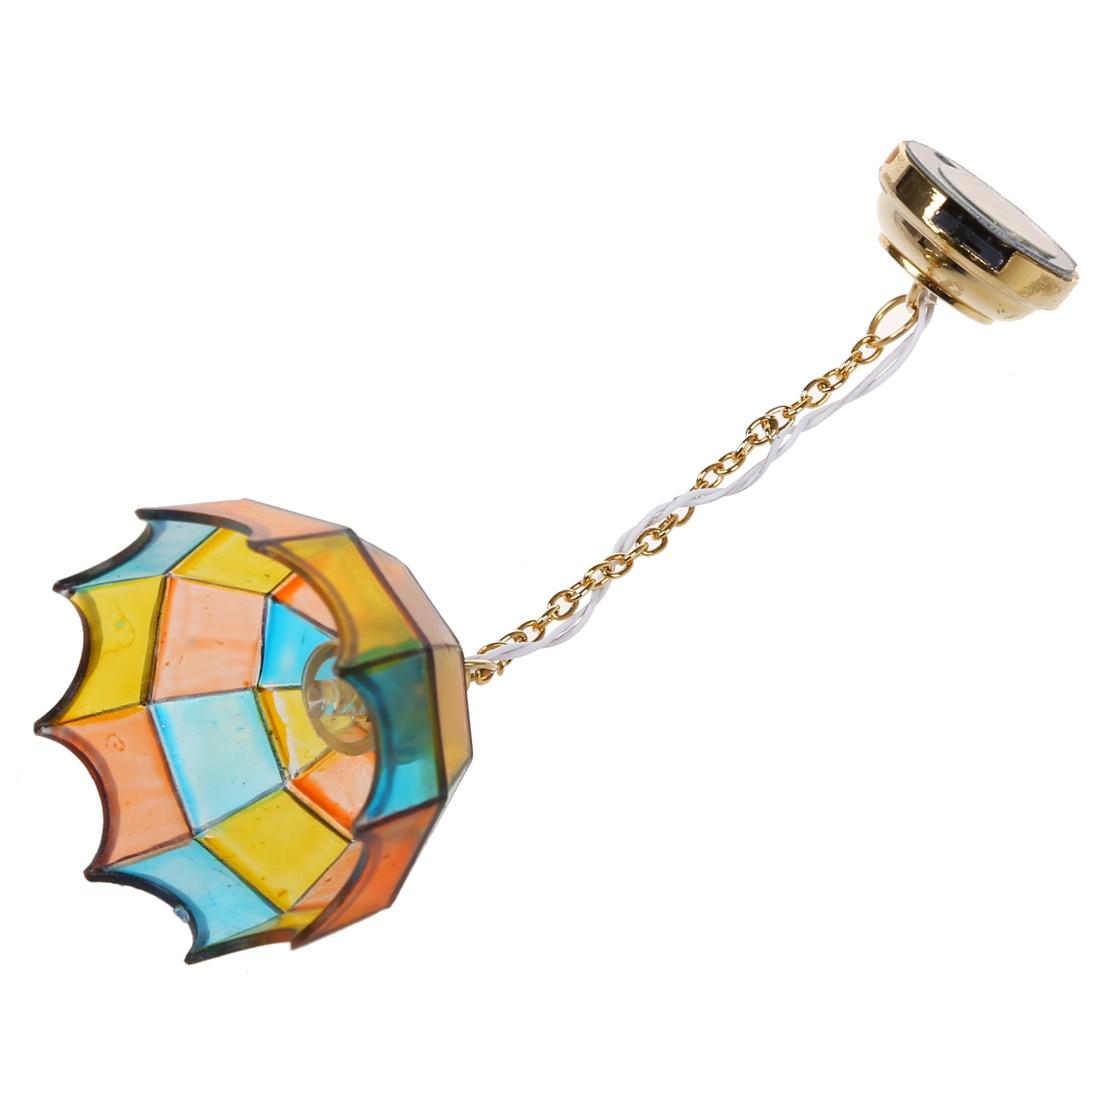 Metal 1:12 Dollhouse Miniature Ceiling Lamp Model With Multicolor Umbrella Shape Lampshade